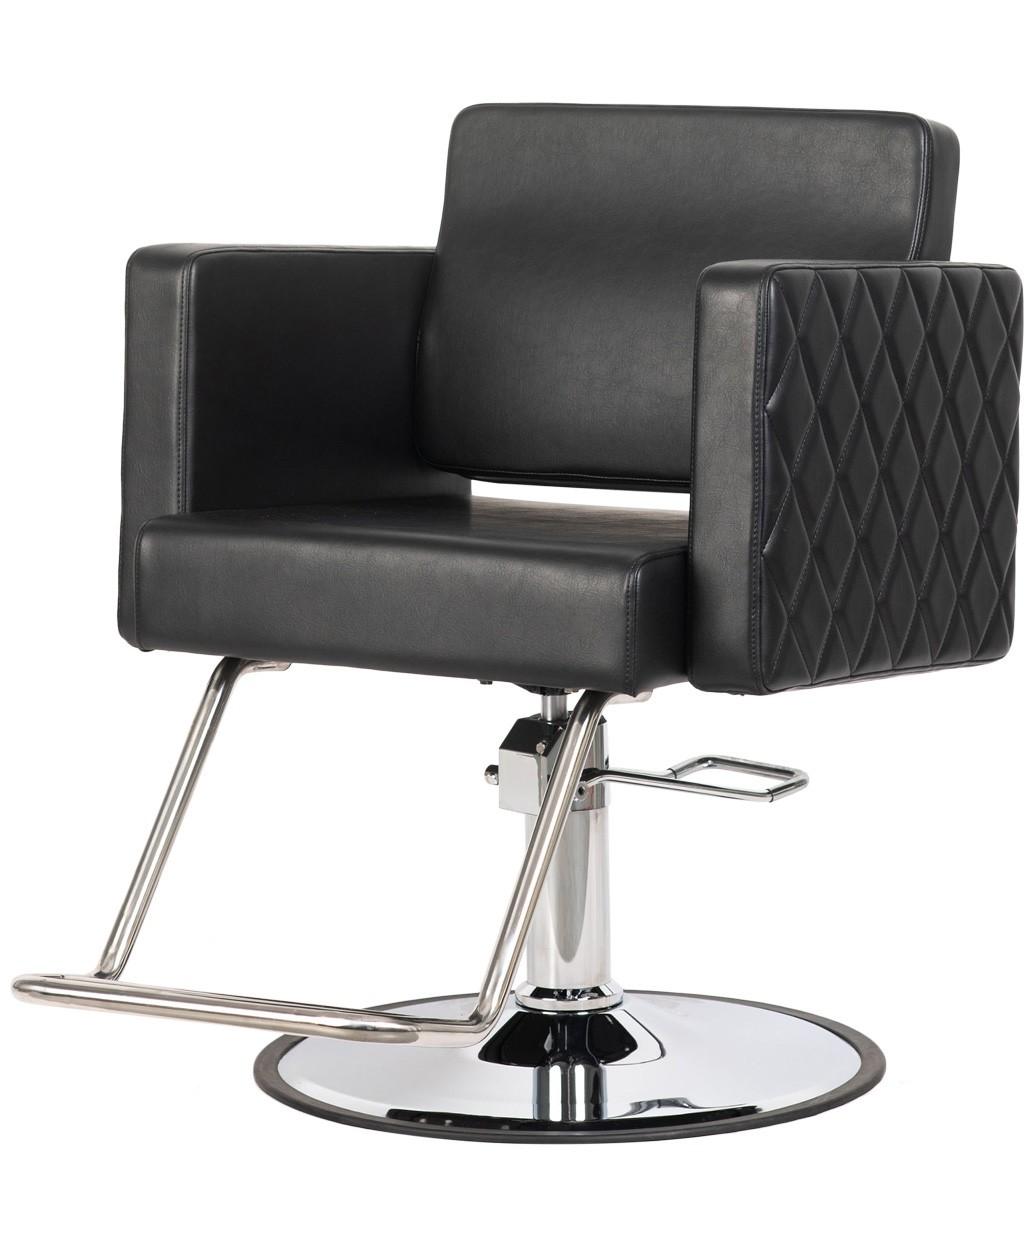 Diamond Styling Chair